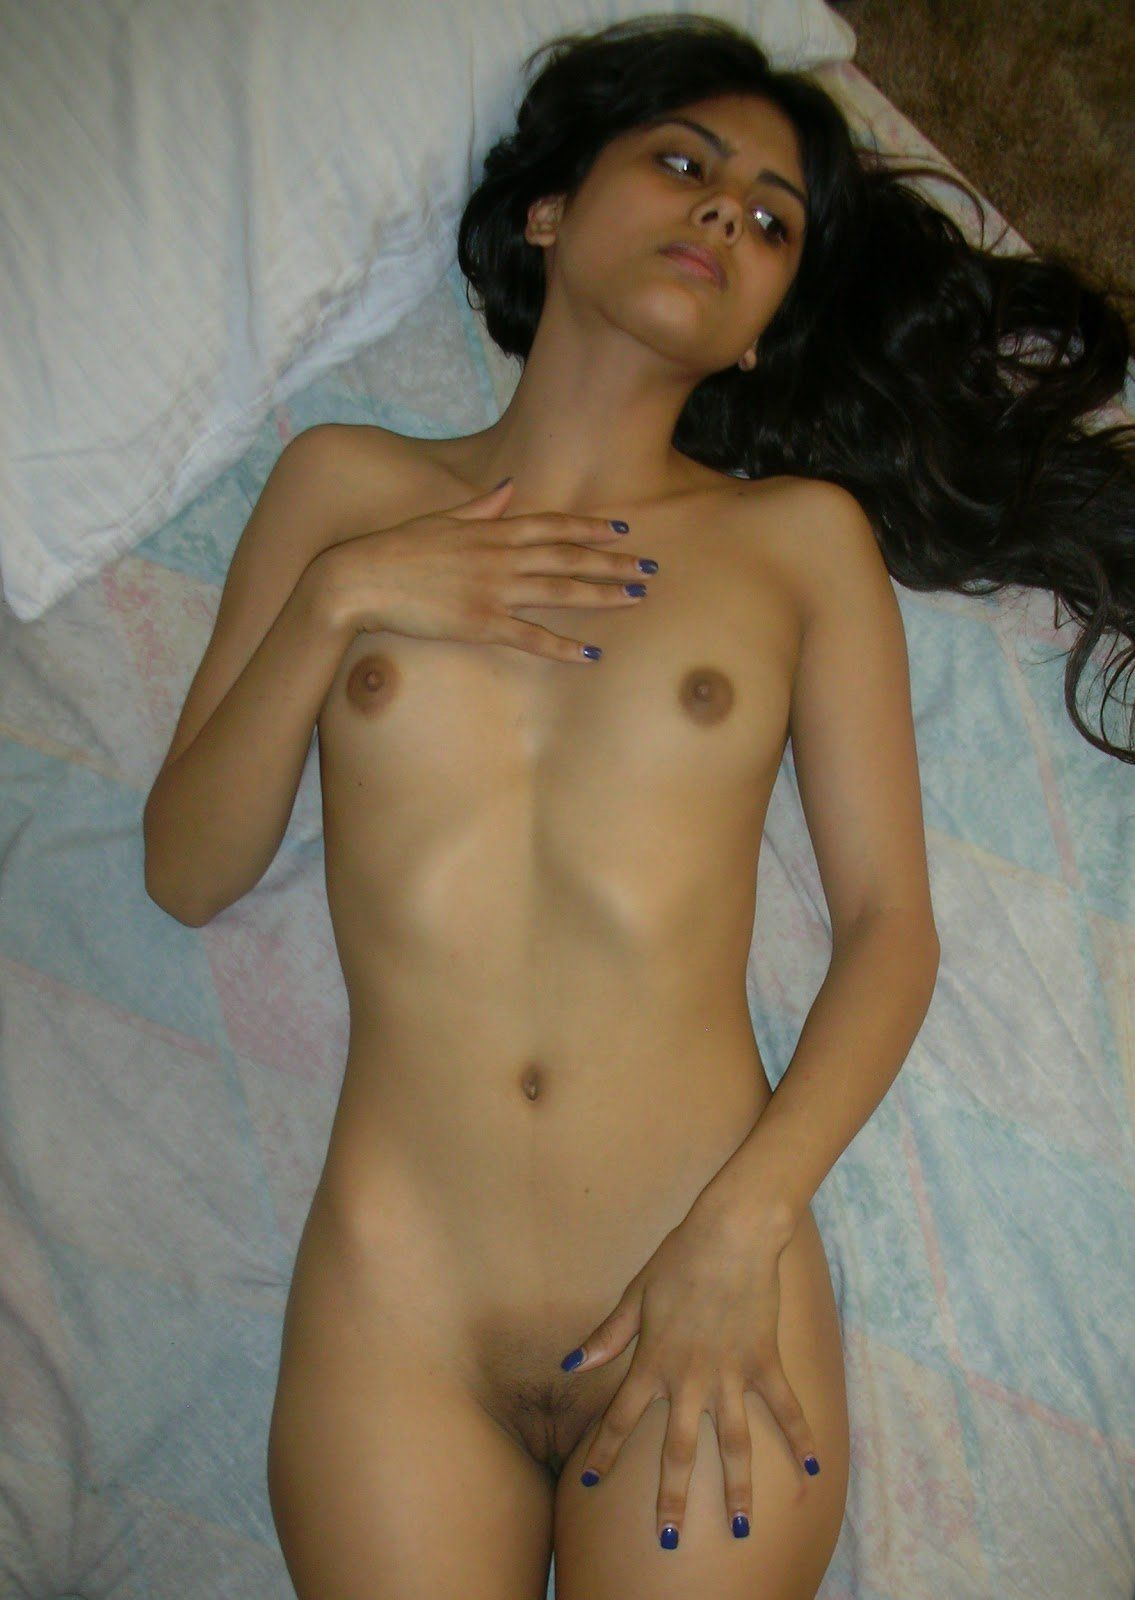 Amaetur Teen Porn naked pakistani girls vagina - new porn. comments: 5